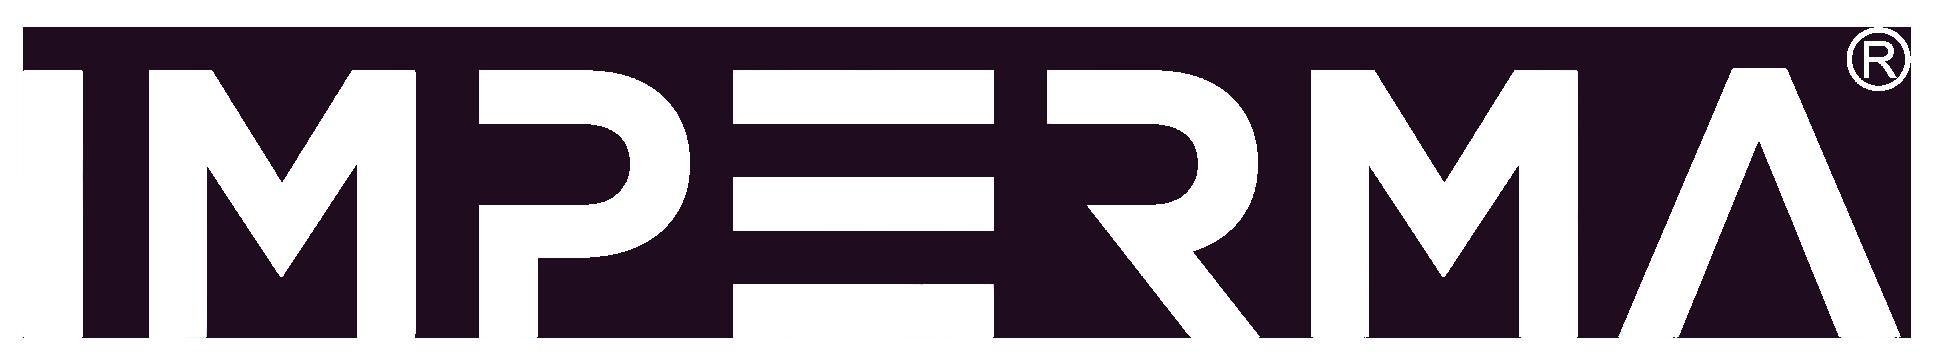 IMPERMA